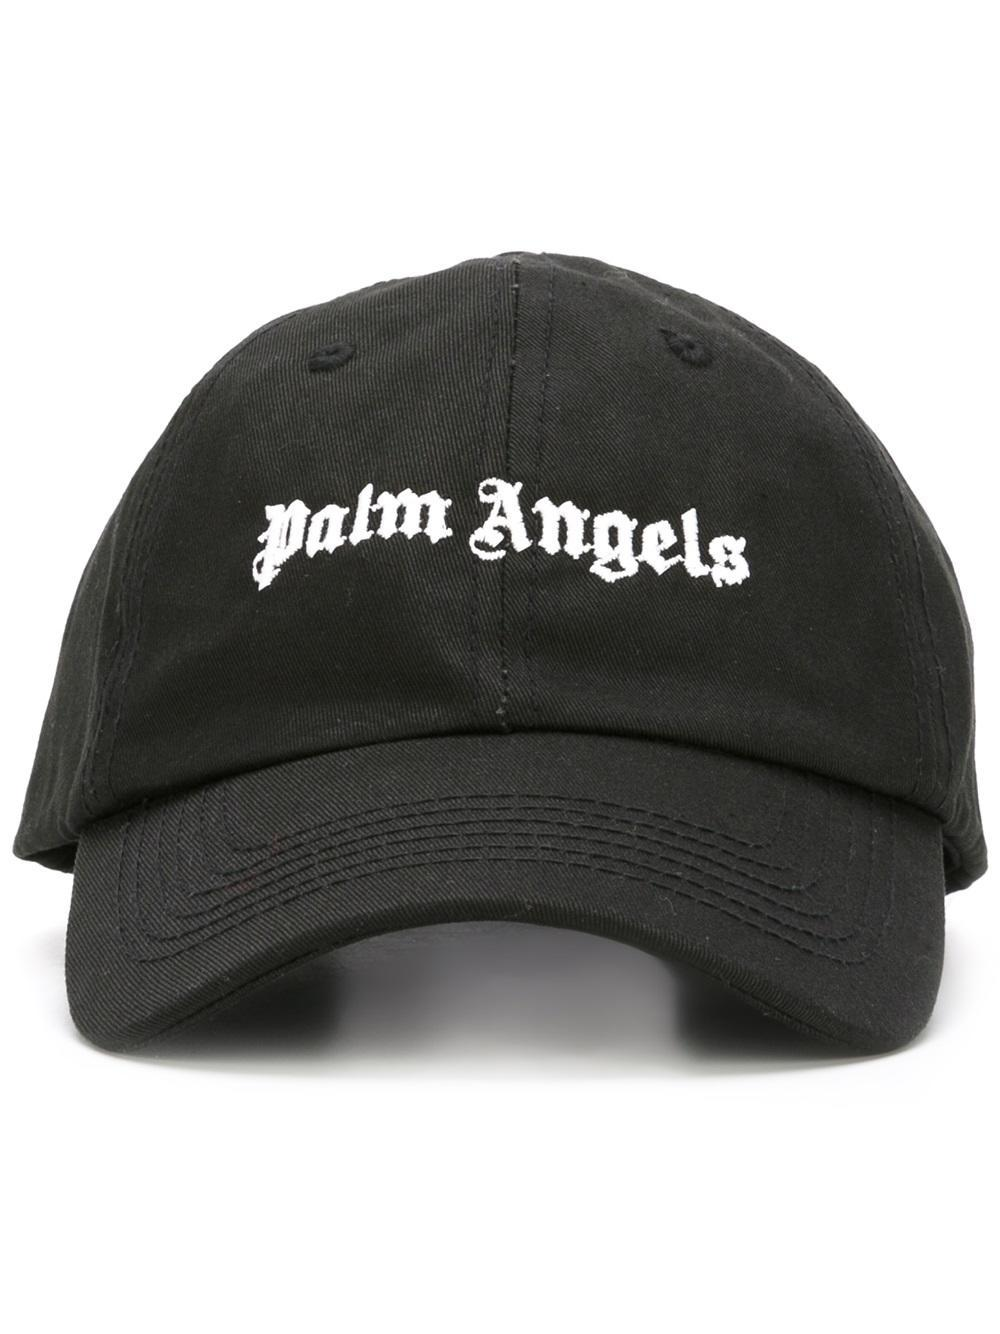 logo patch beanie hat - Black Palm Angels ytR6gi